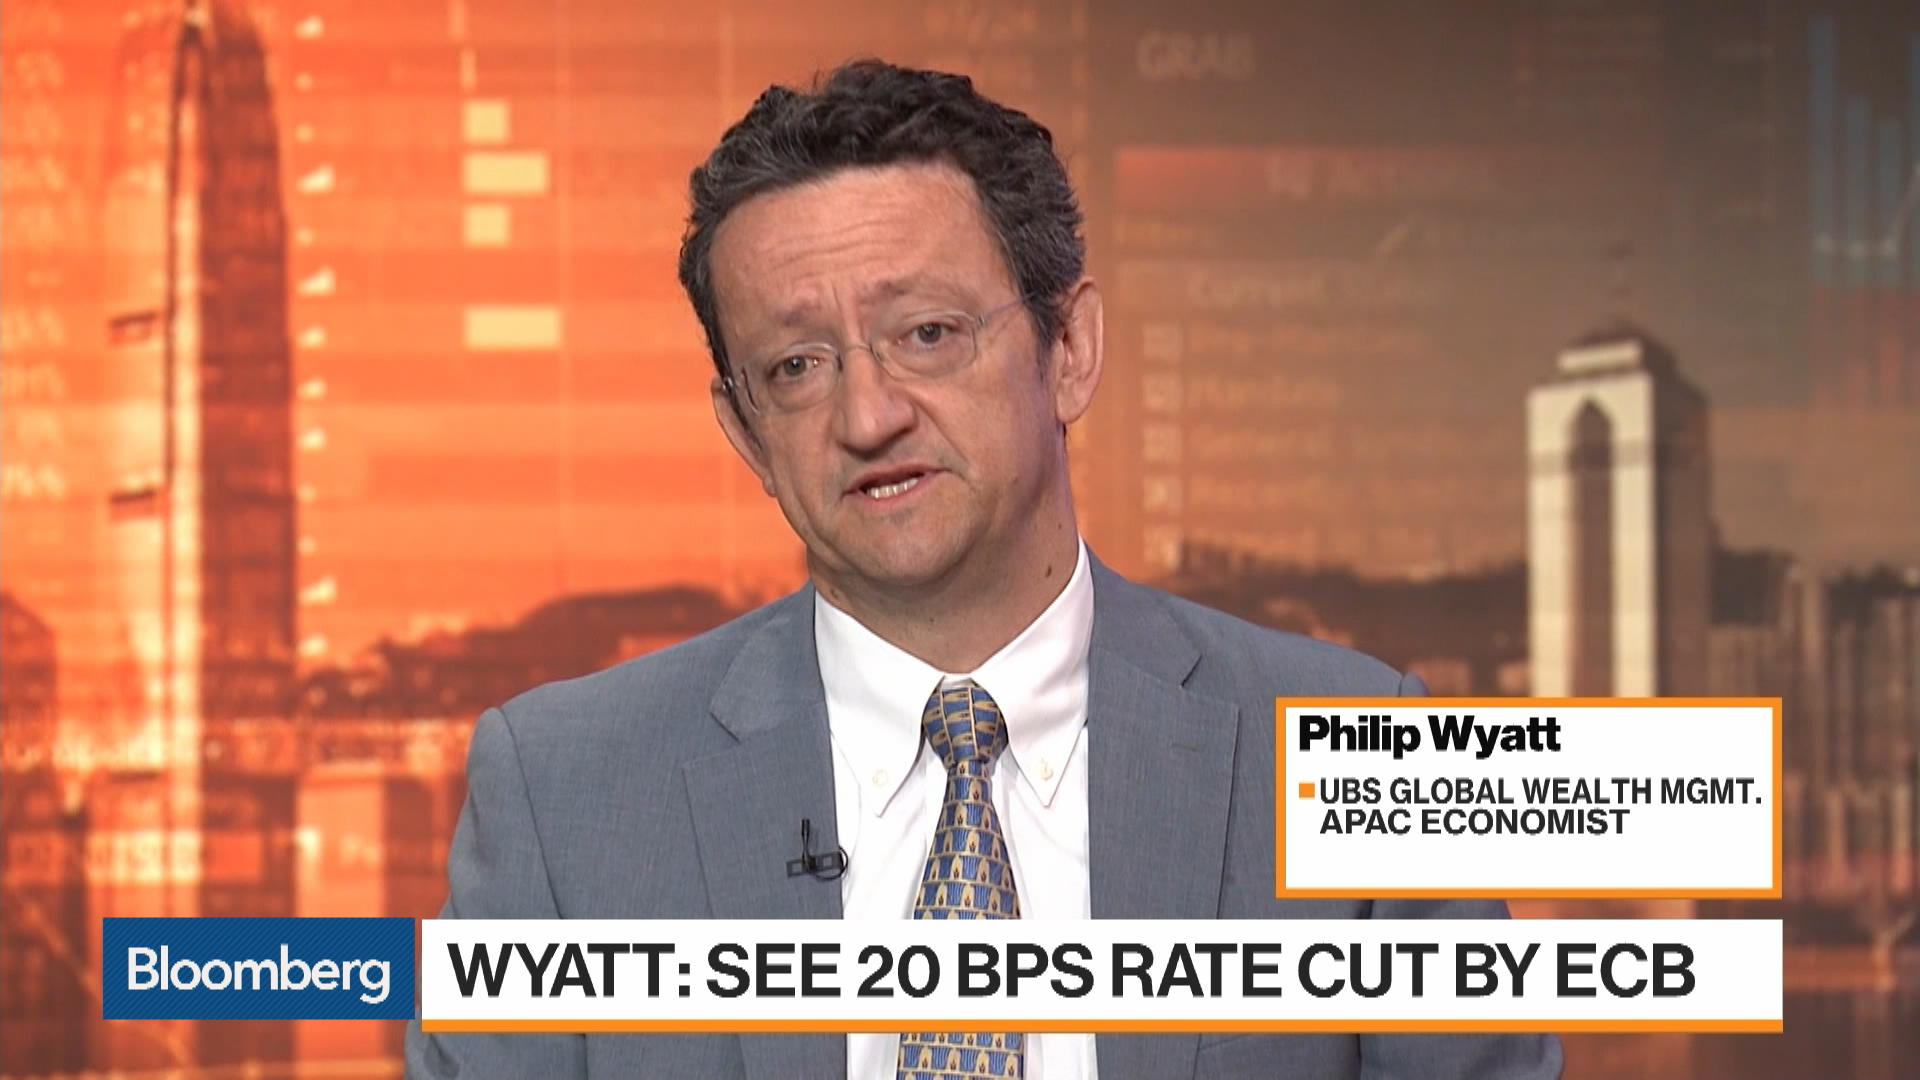 Philip Wyatt, Economist at UBS Global Wealth Management, on